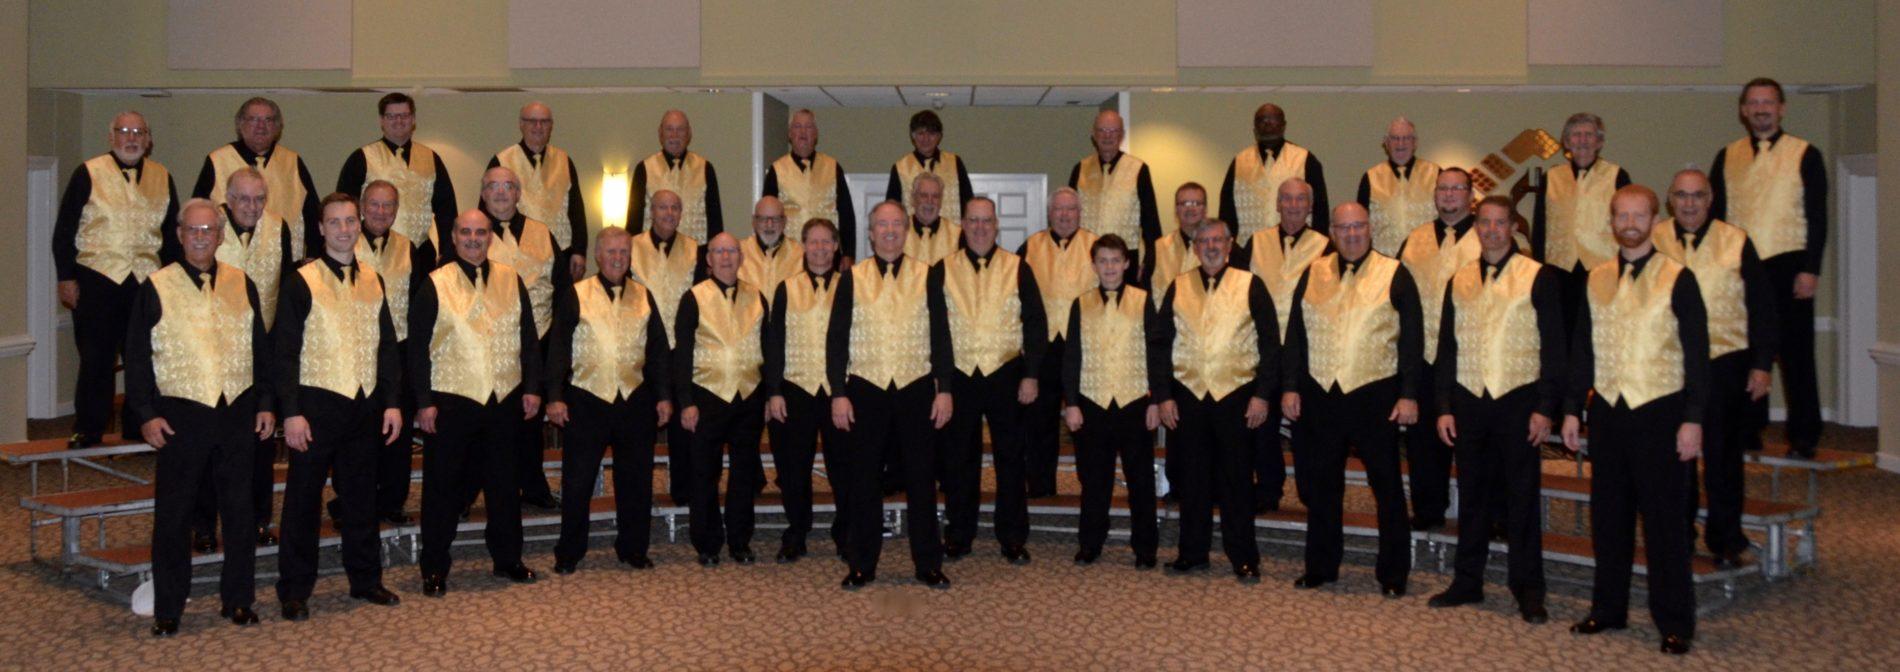 Gold Standard Chorus 2018 at Aldersgate in Charlotte NC